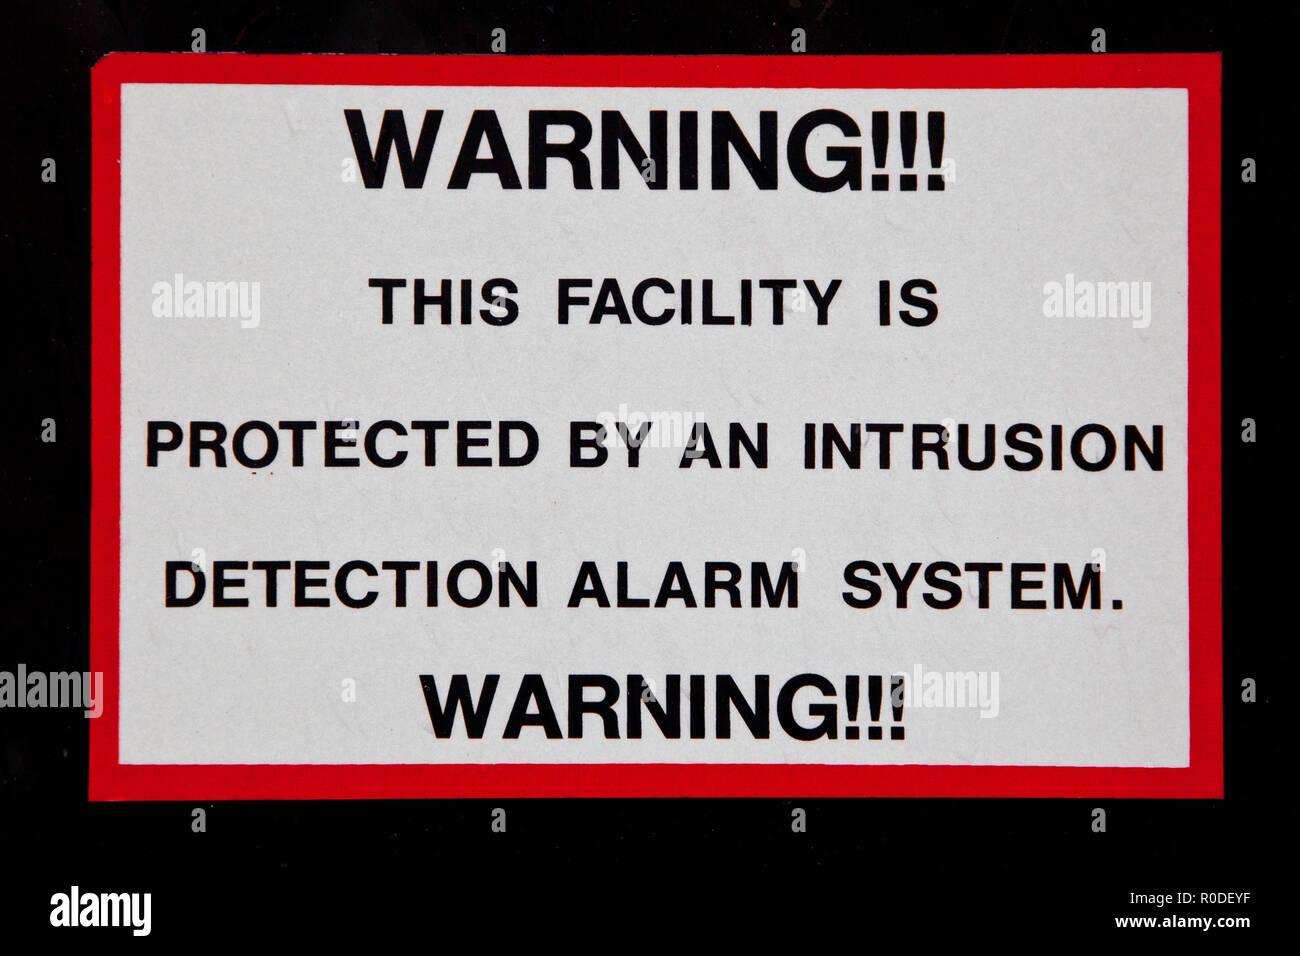 Intrusion Detection Alarm System Warning Sign - Stock Image